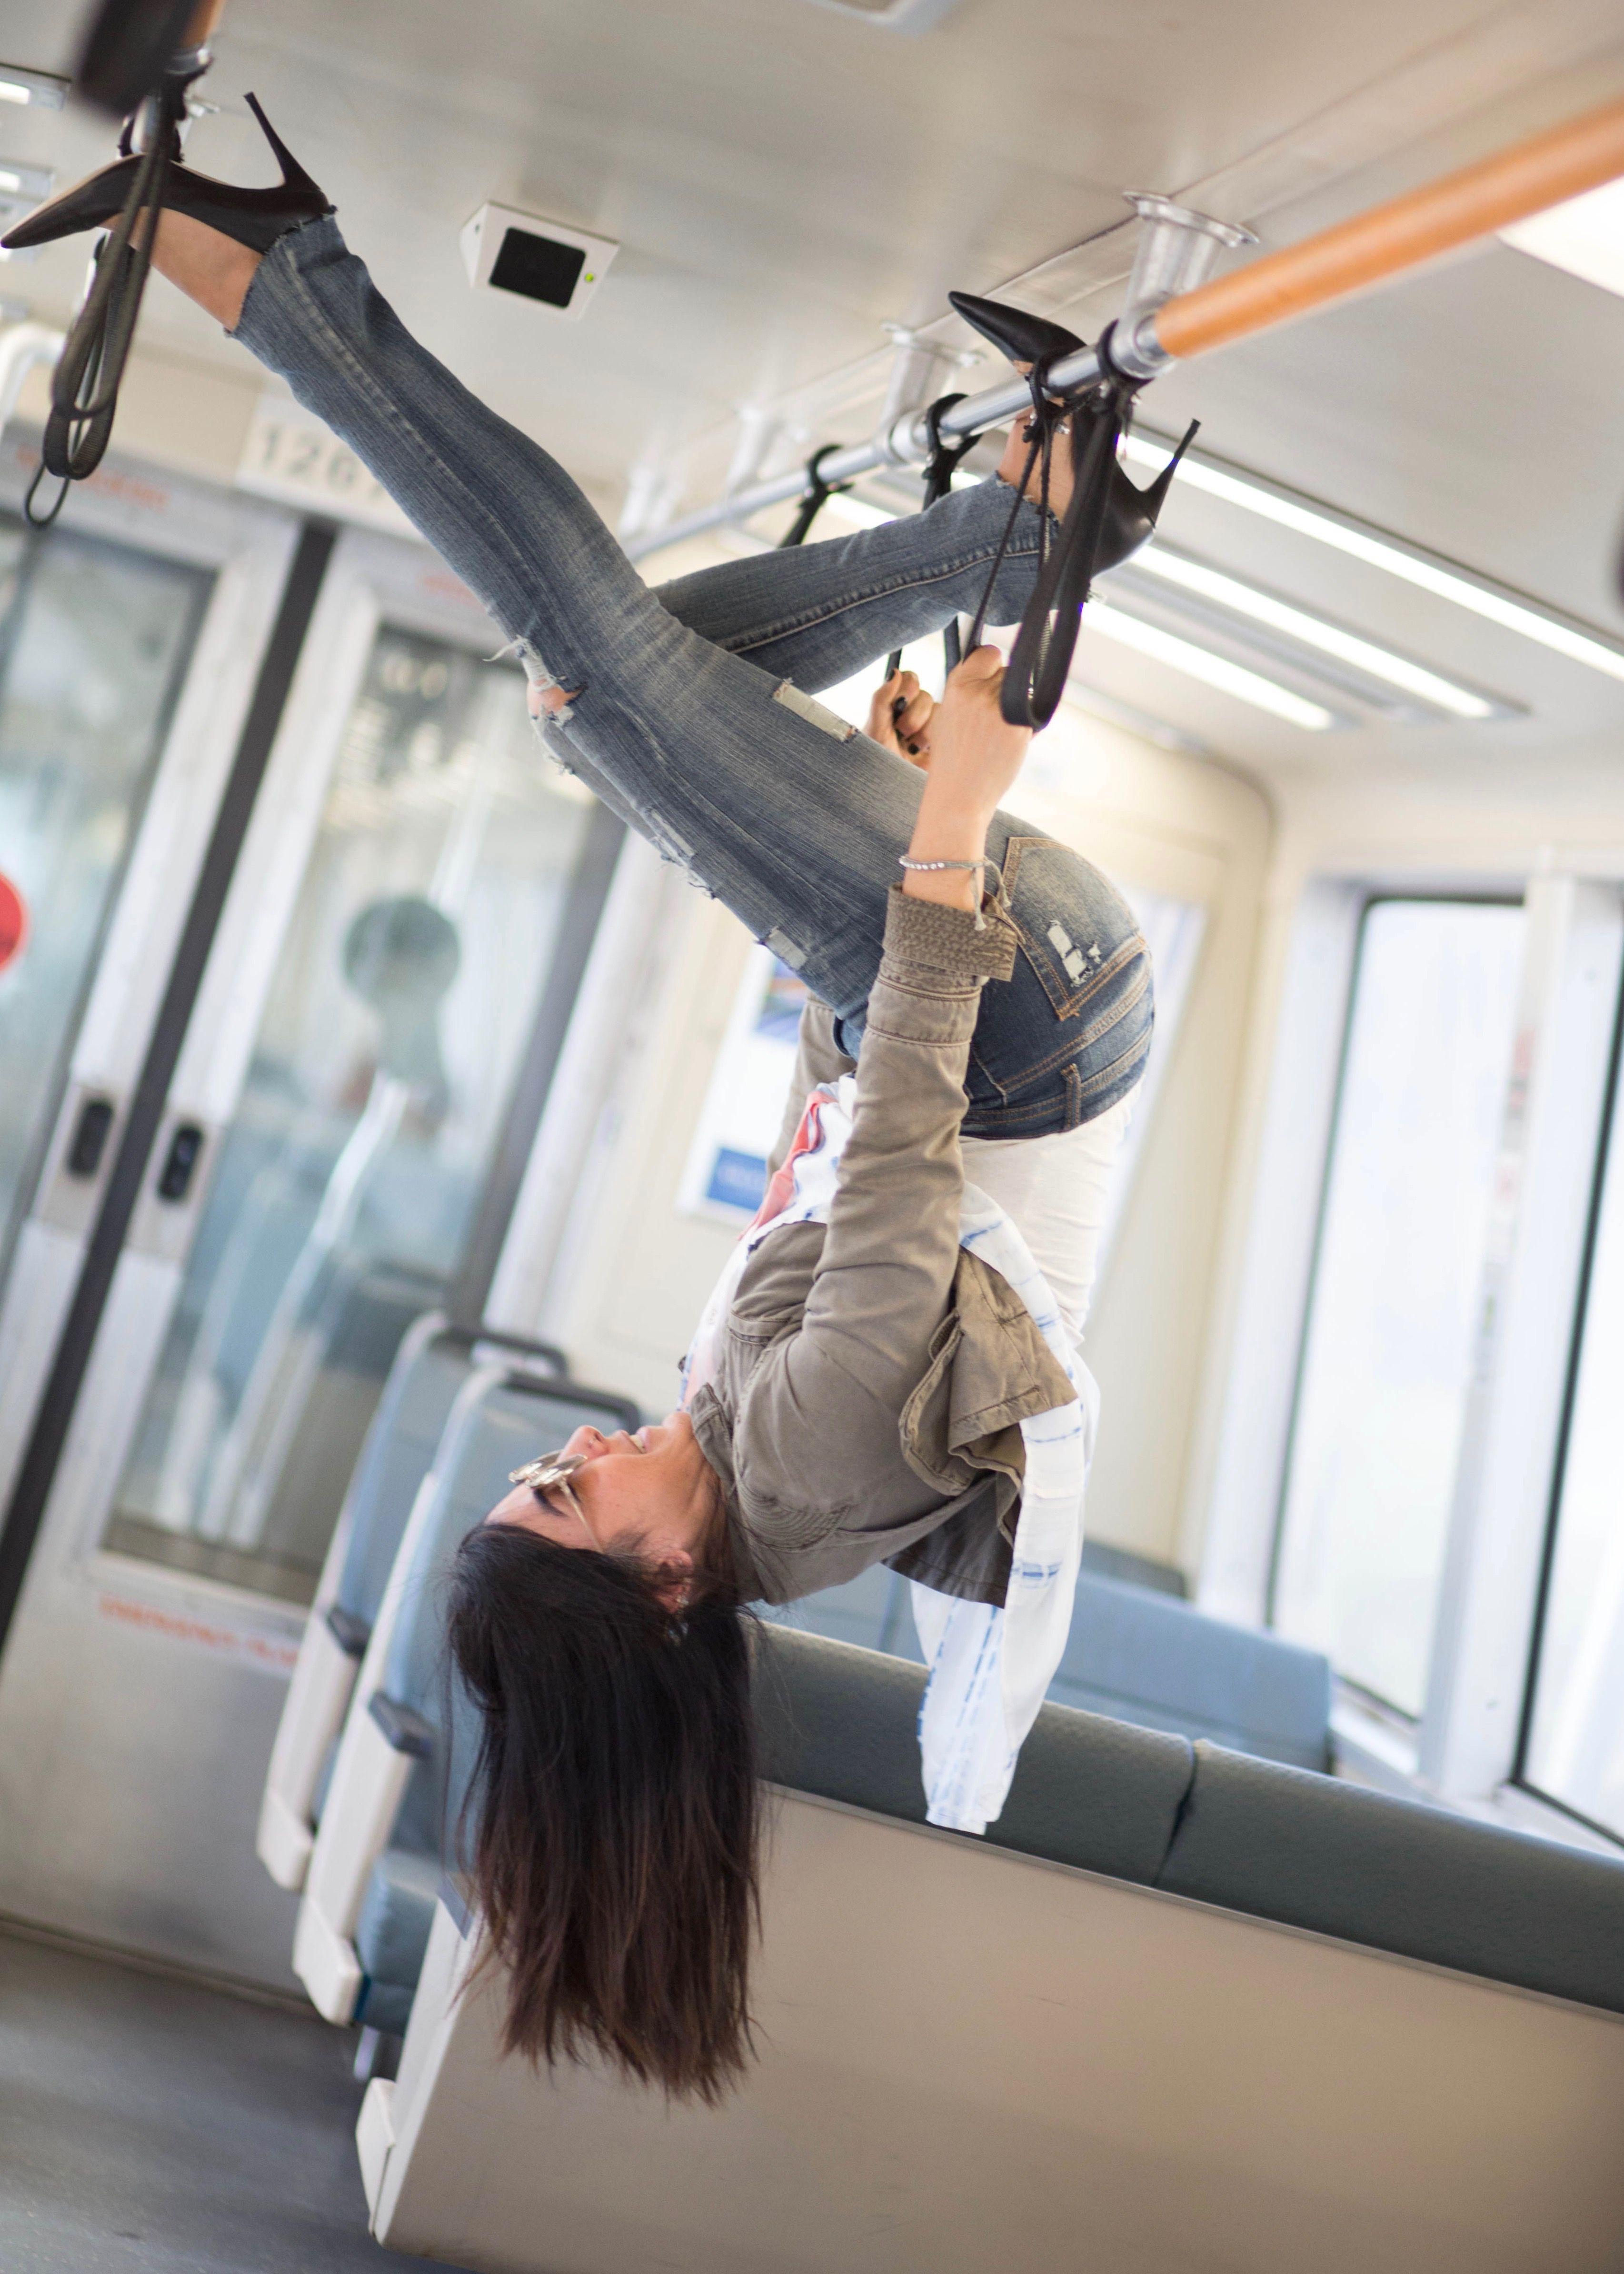 Just hanging around. Subway photos. BART pics. Fitness fun. subway fashion photo shoot